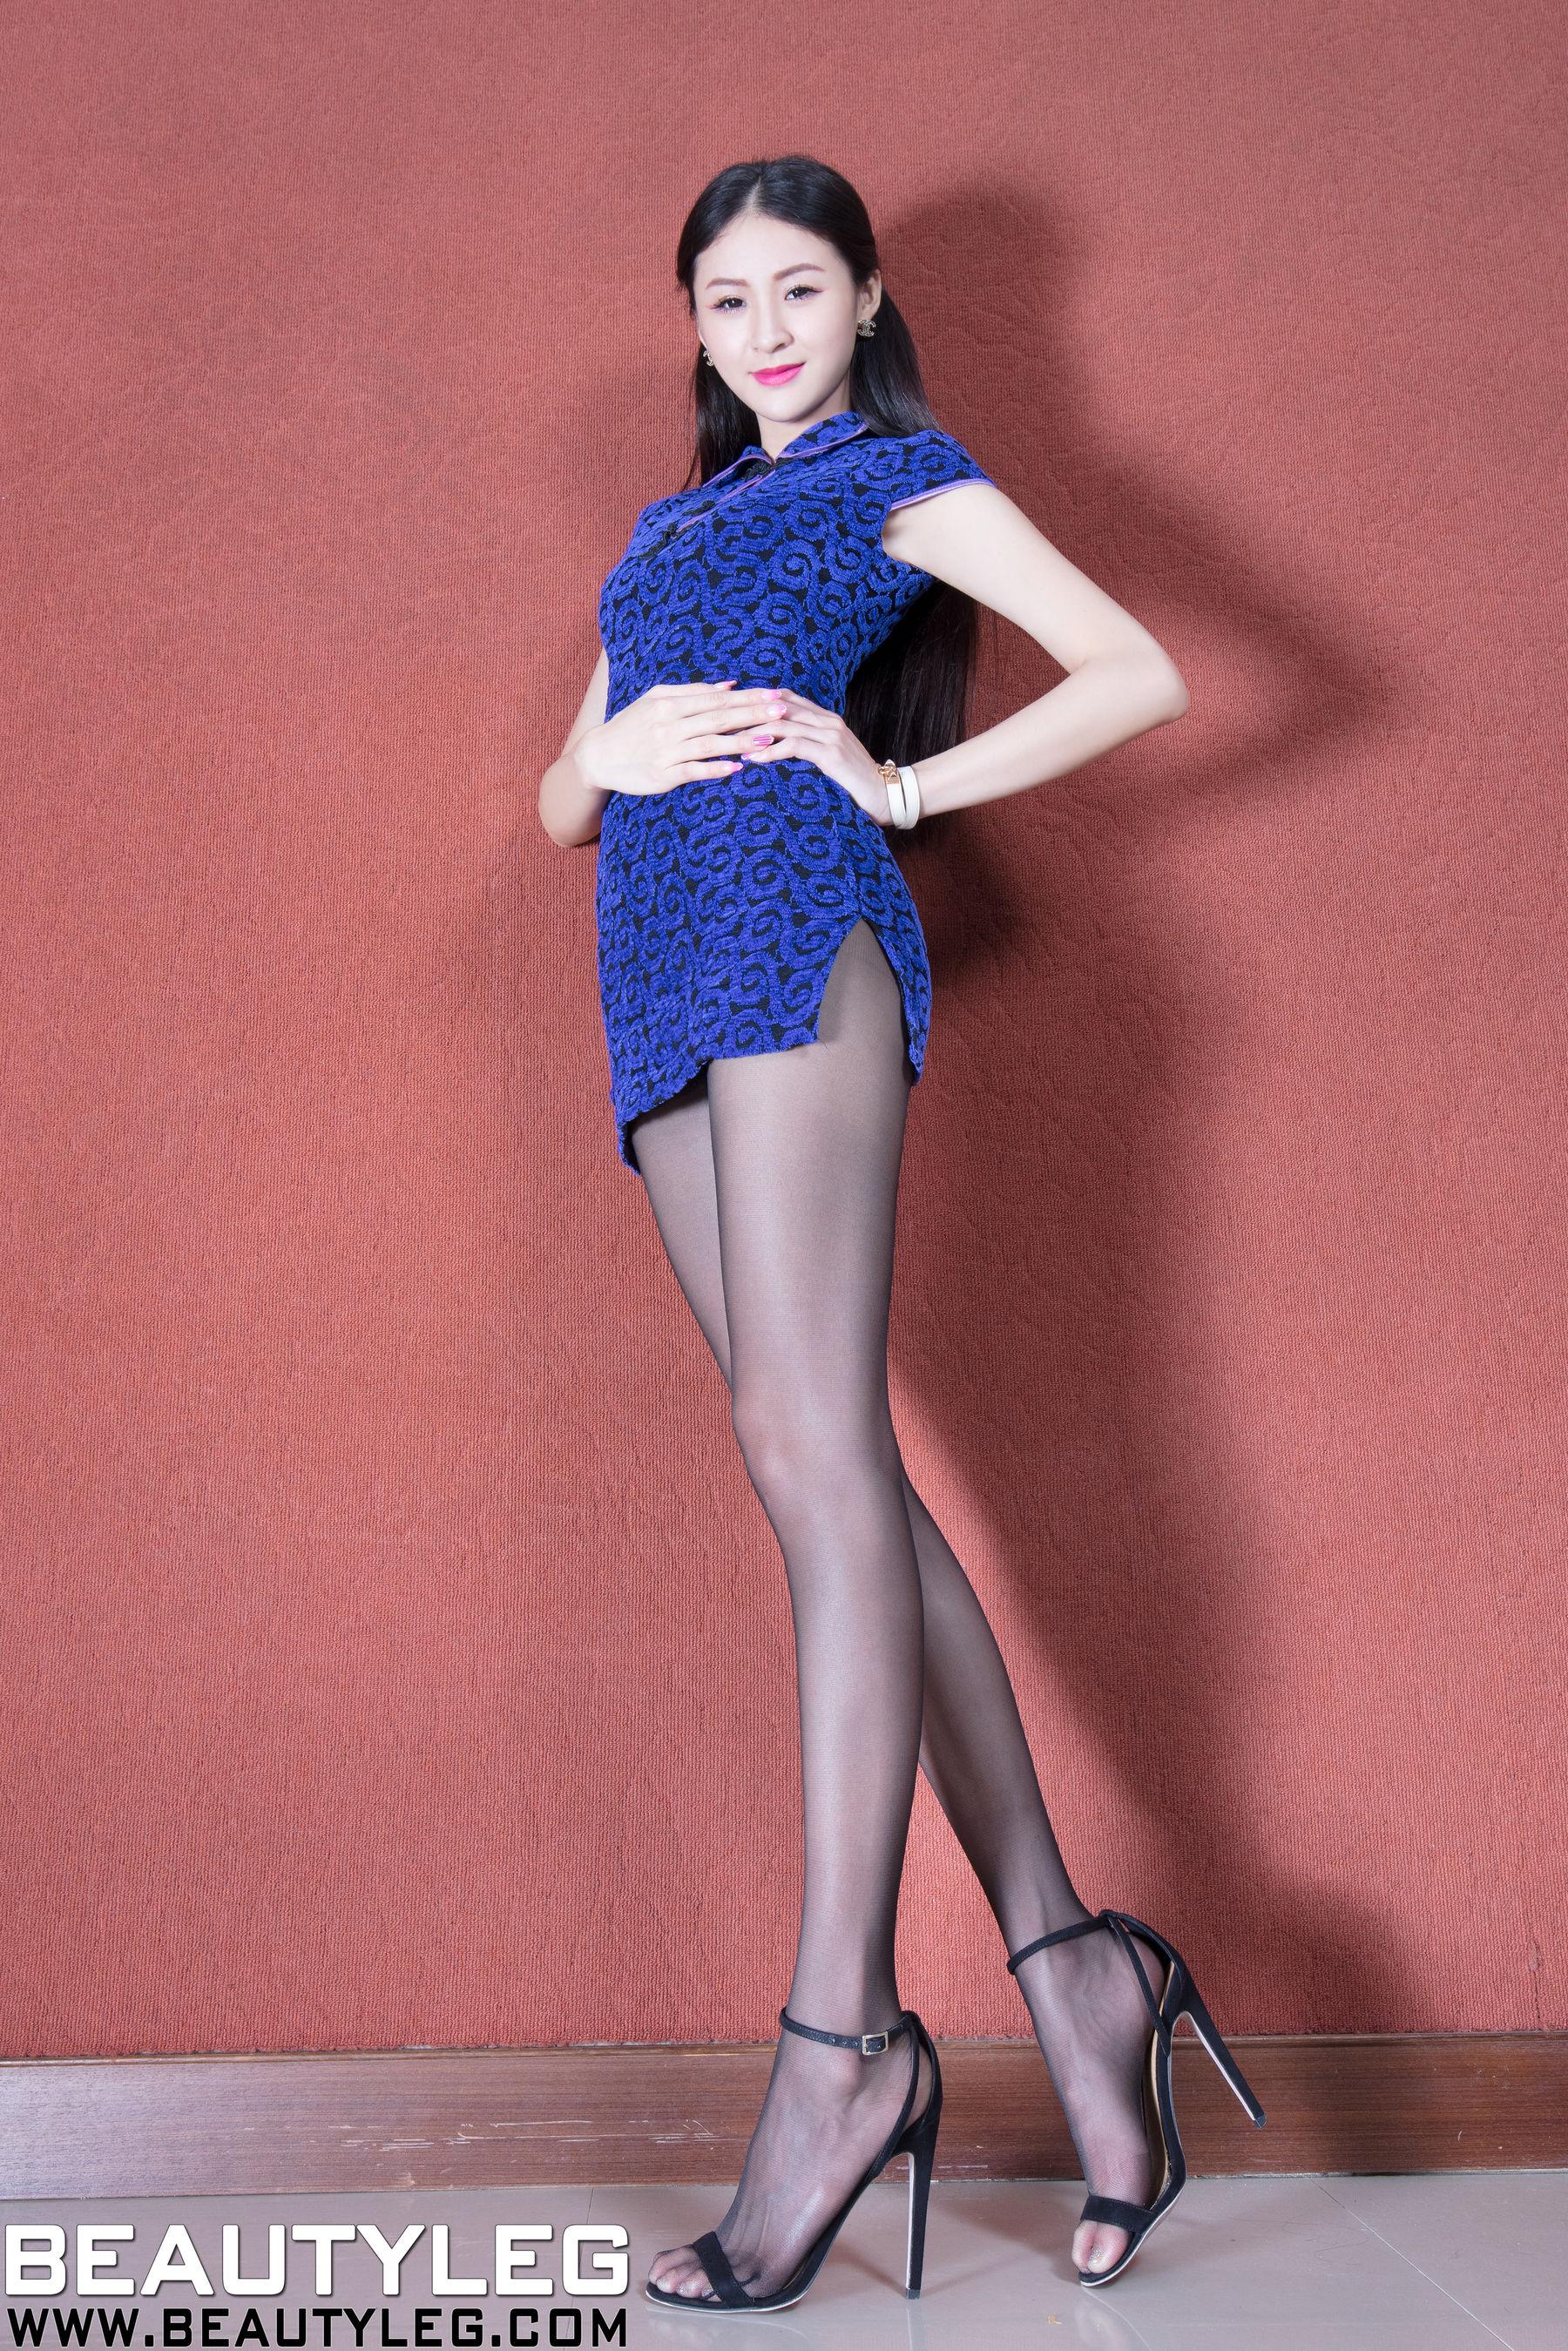 VOL.251 [Beautyleg]美腿高跟包臀裙美女:Lola雪岑(腿模Lola)超高清个人性感漂亮大图(46P)